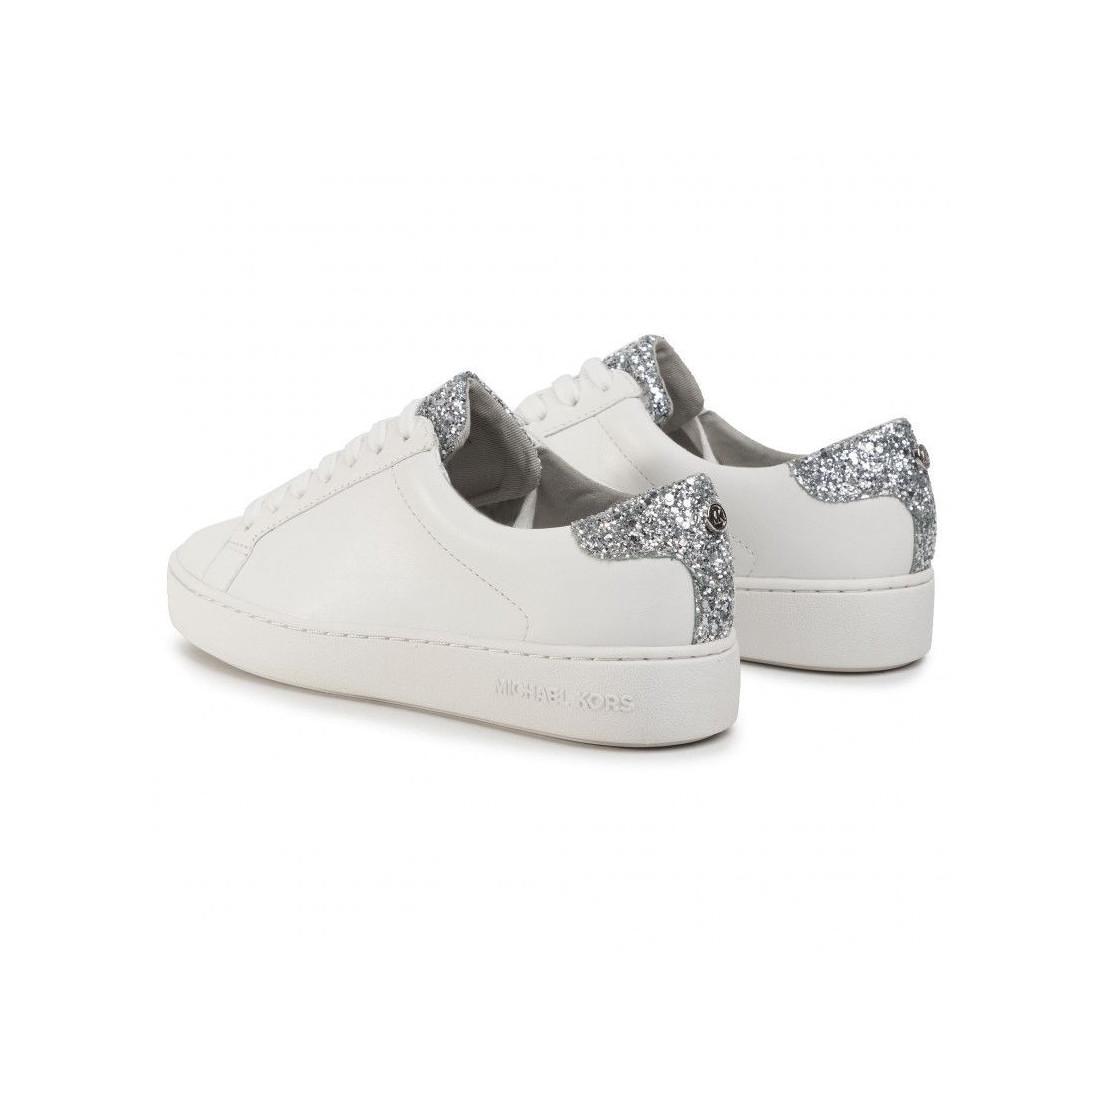 sneakers woman michael kors 43s6irfs1l898 7352